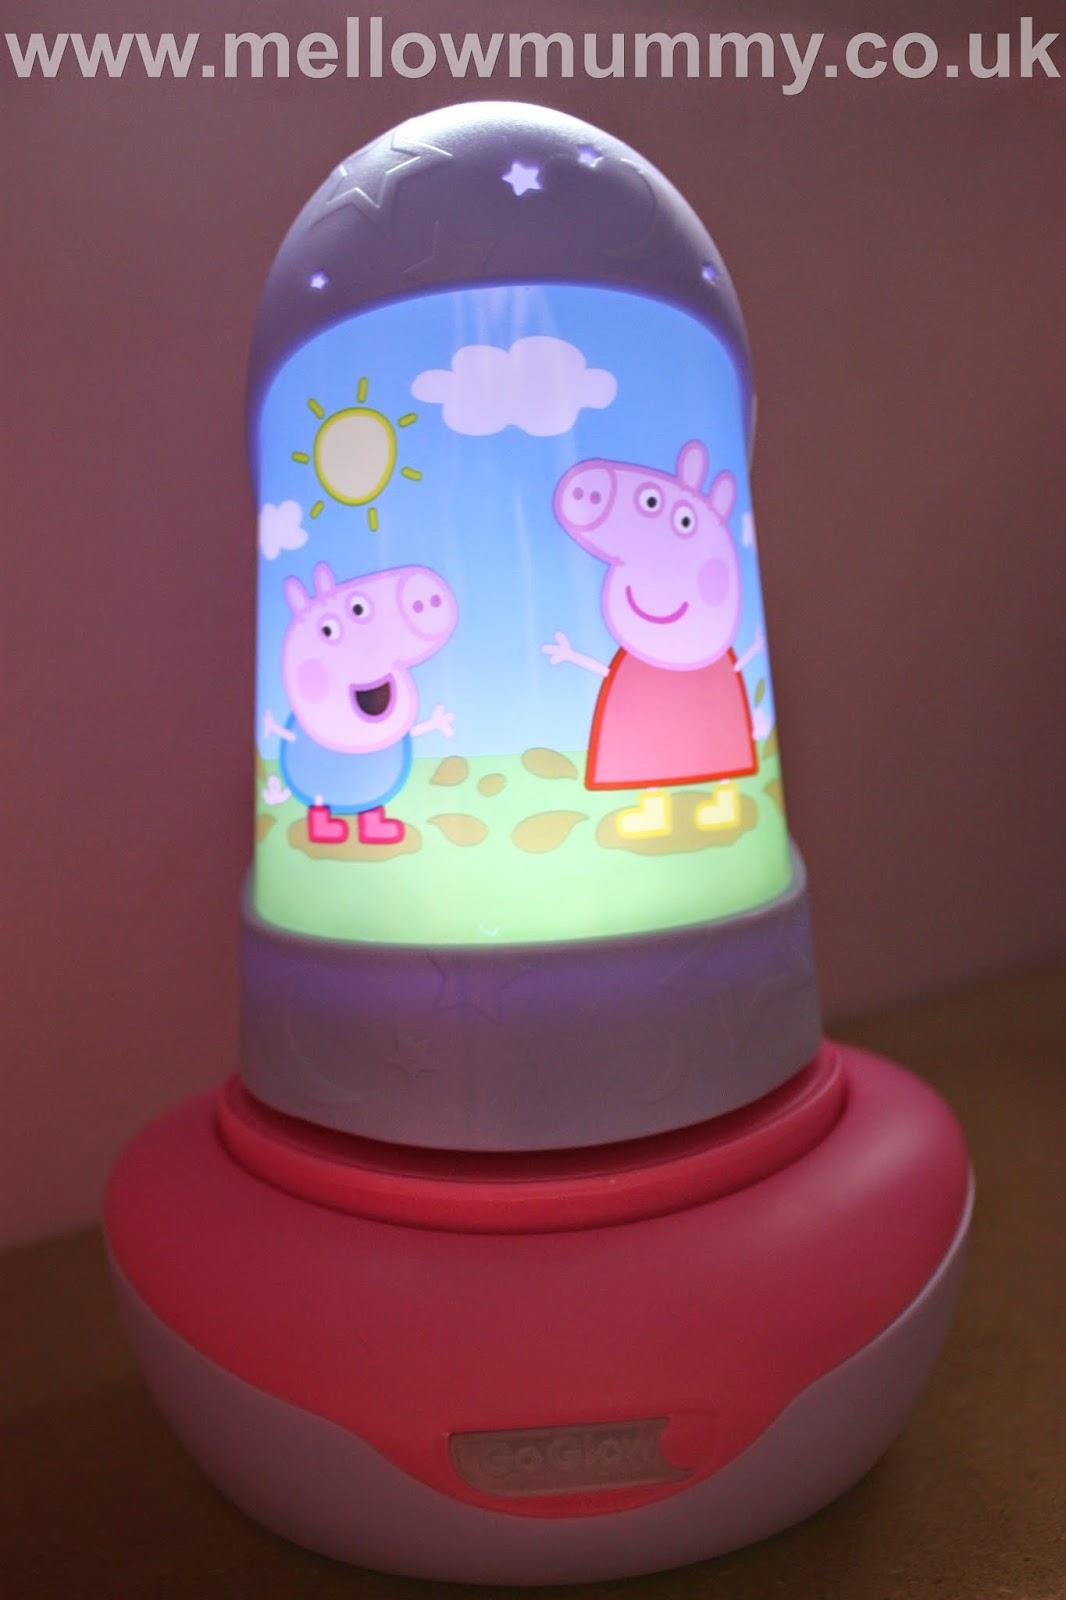 Mellow Mummy Peppa Pig Goglow Night Bright Light Review Taking